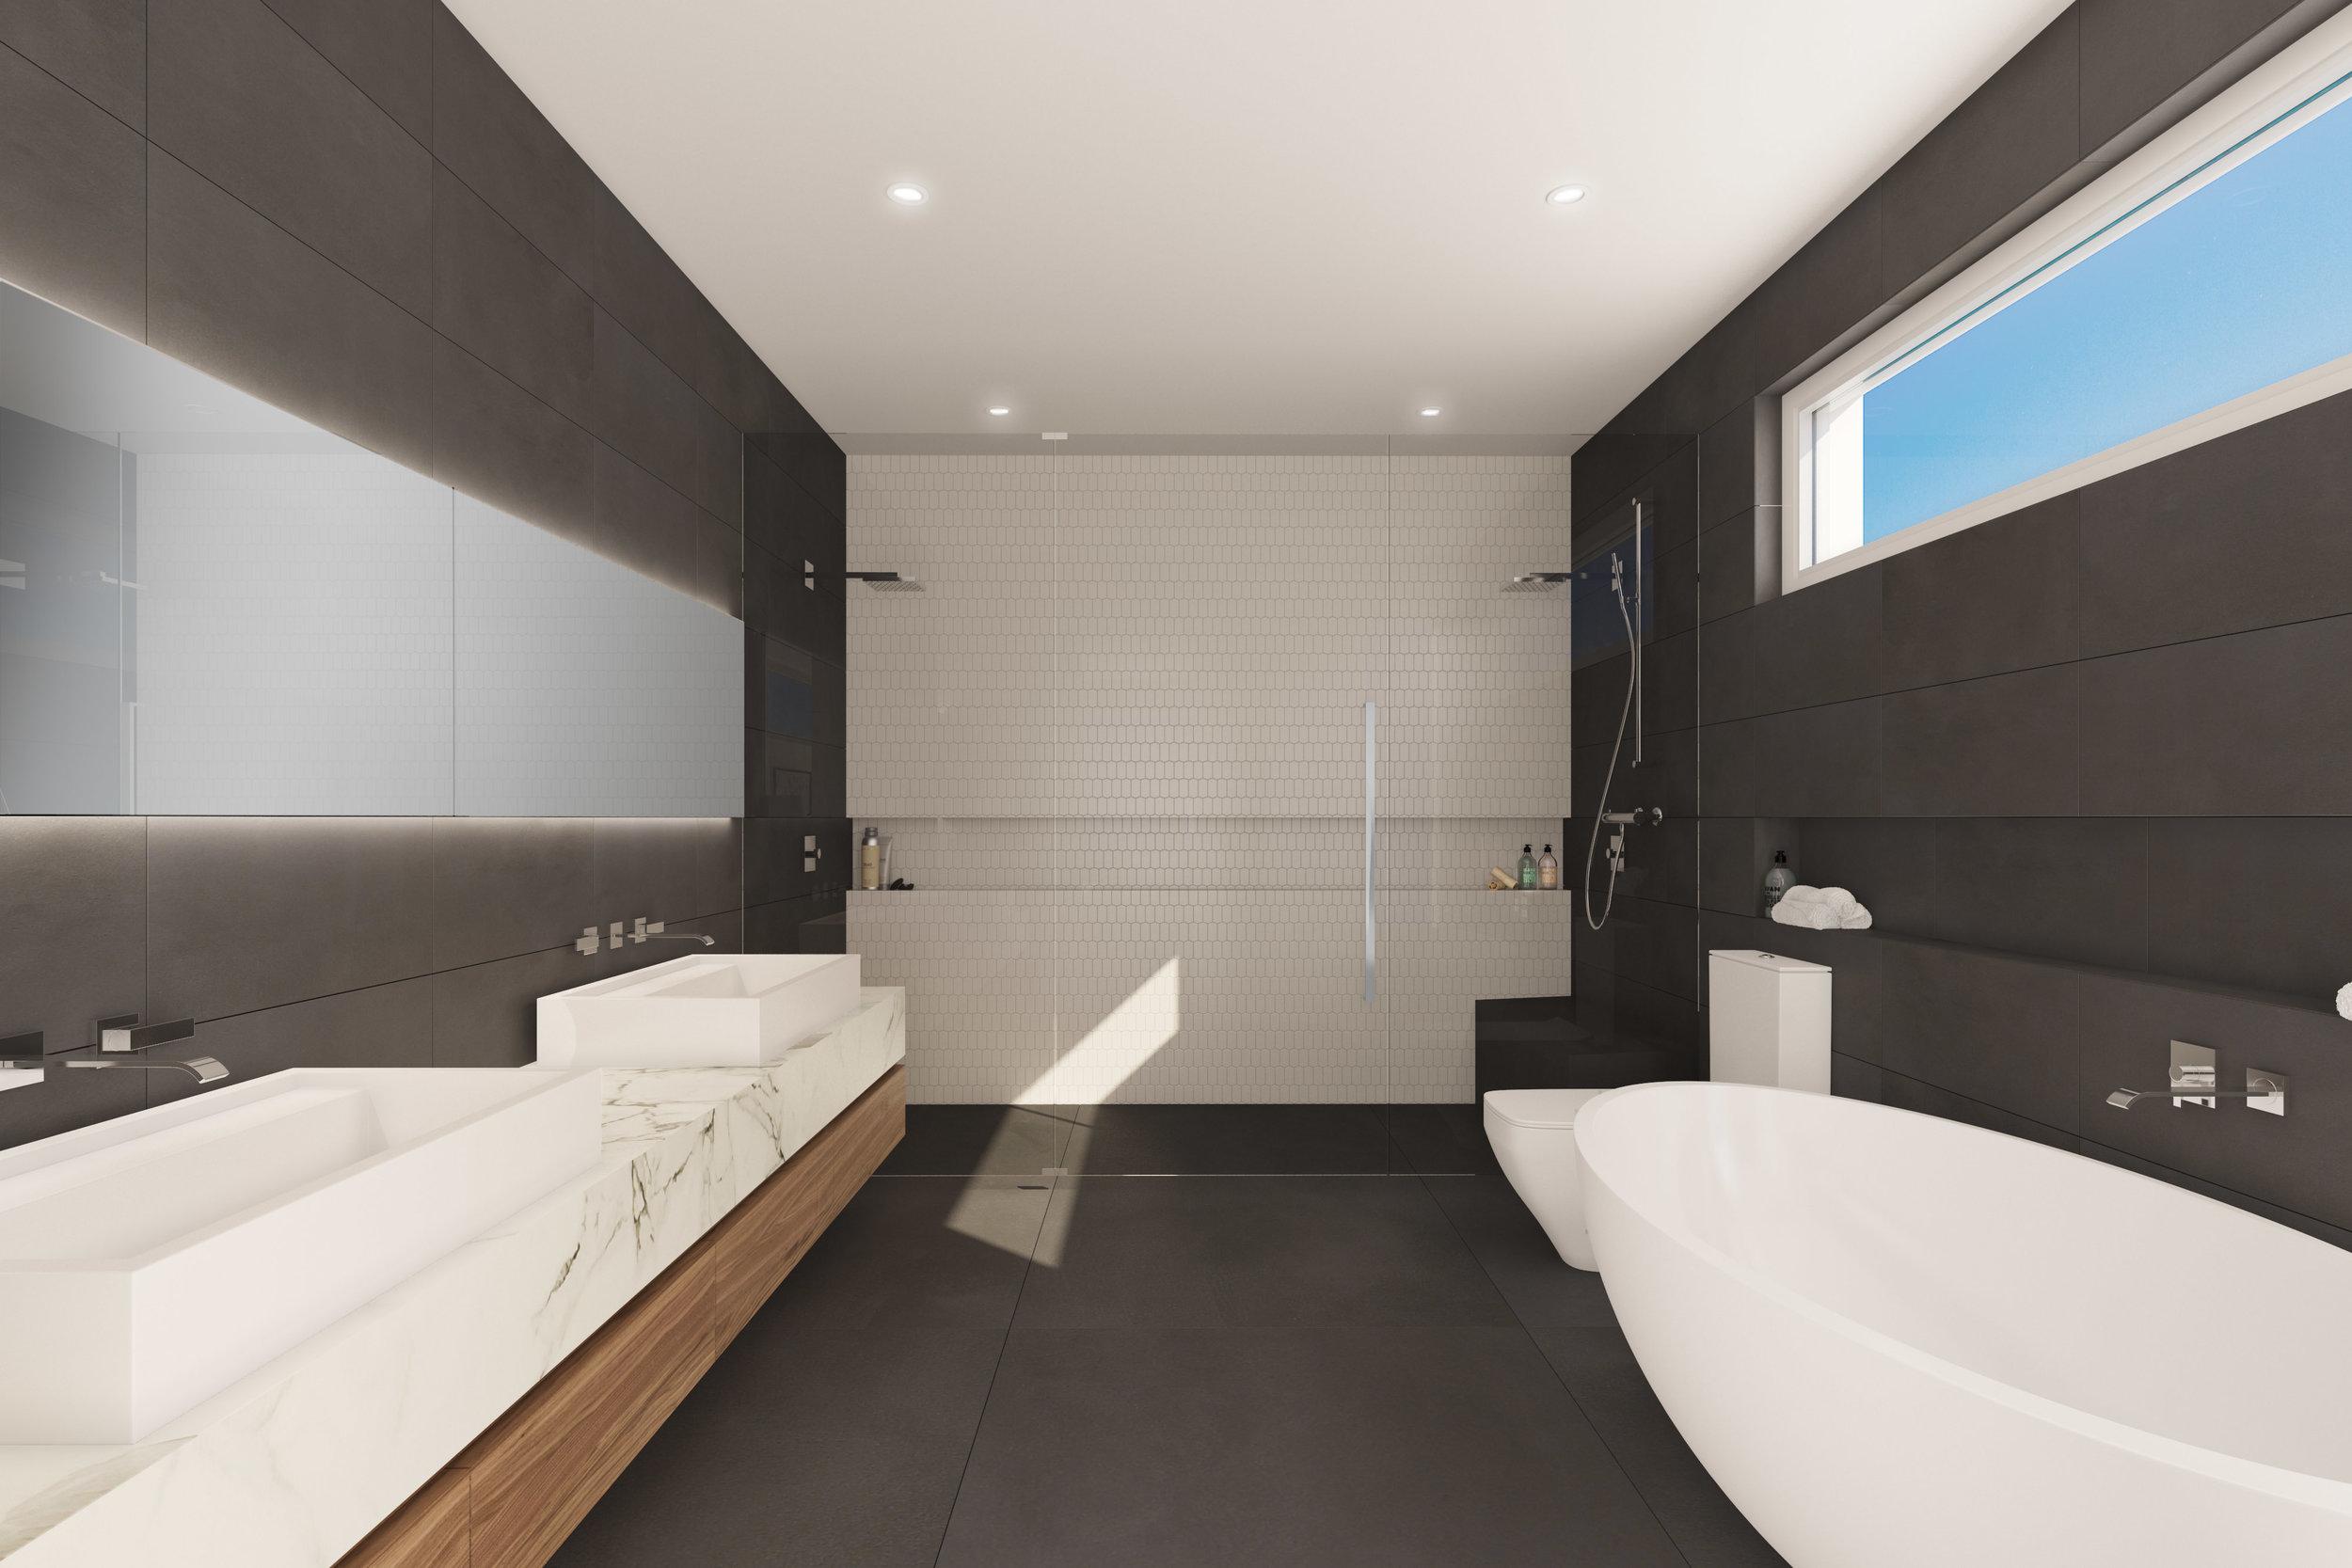 Aqua_Interior_Bathroom B.jpg